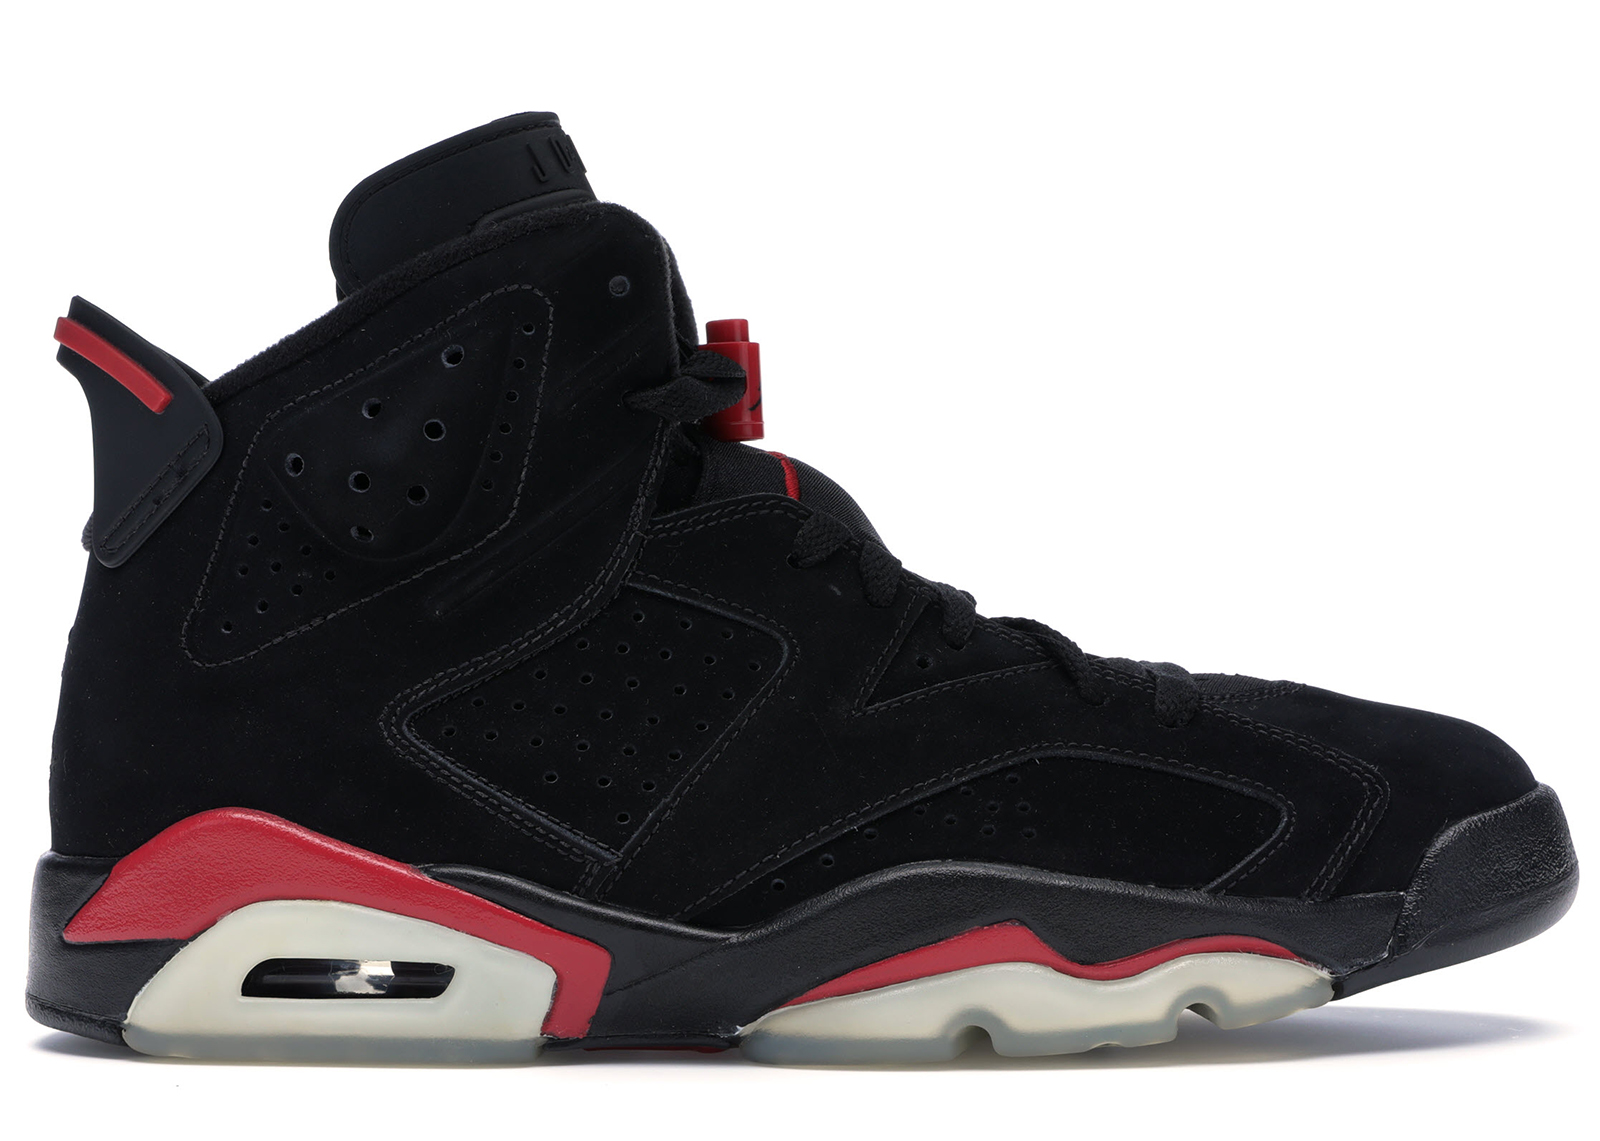 Jordan 6 Retro Black Varsity Red (2010